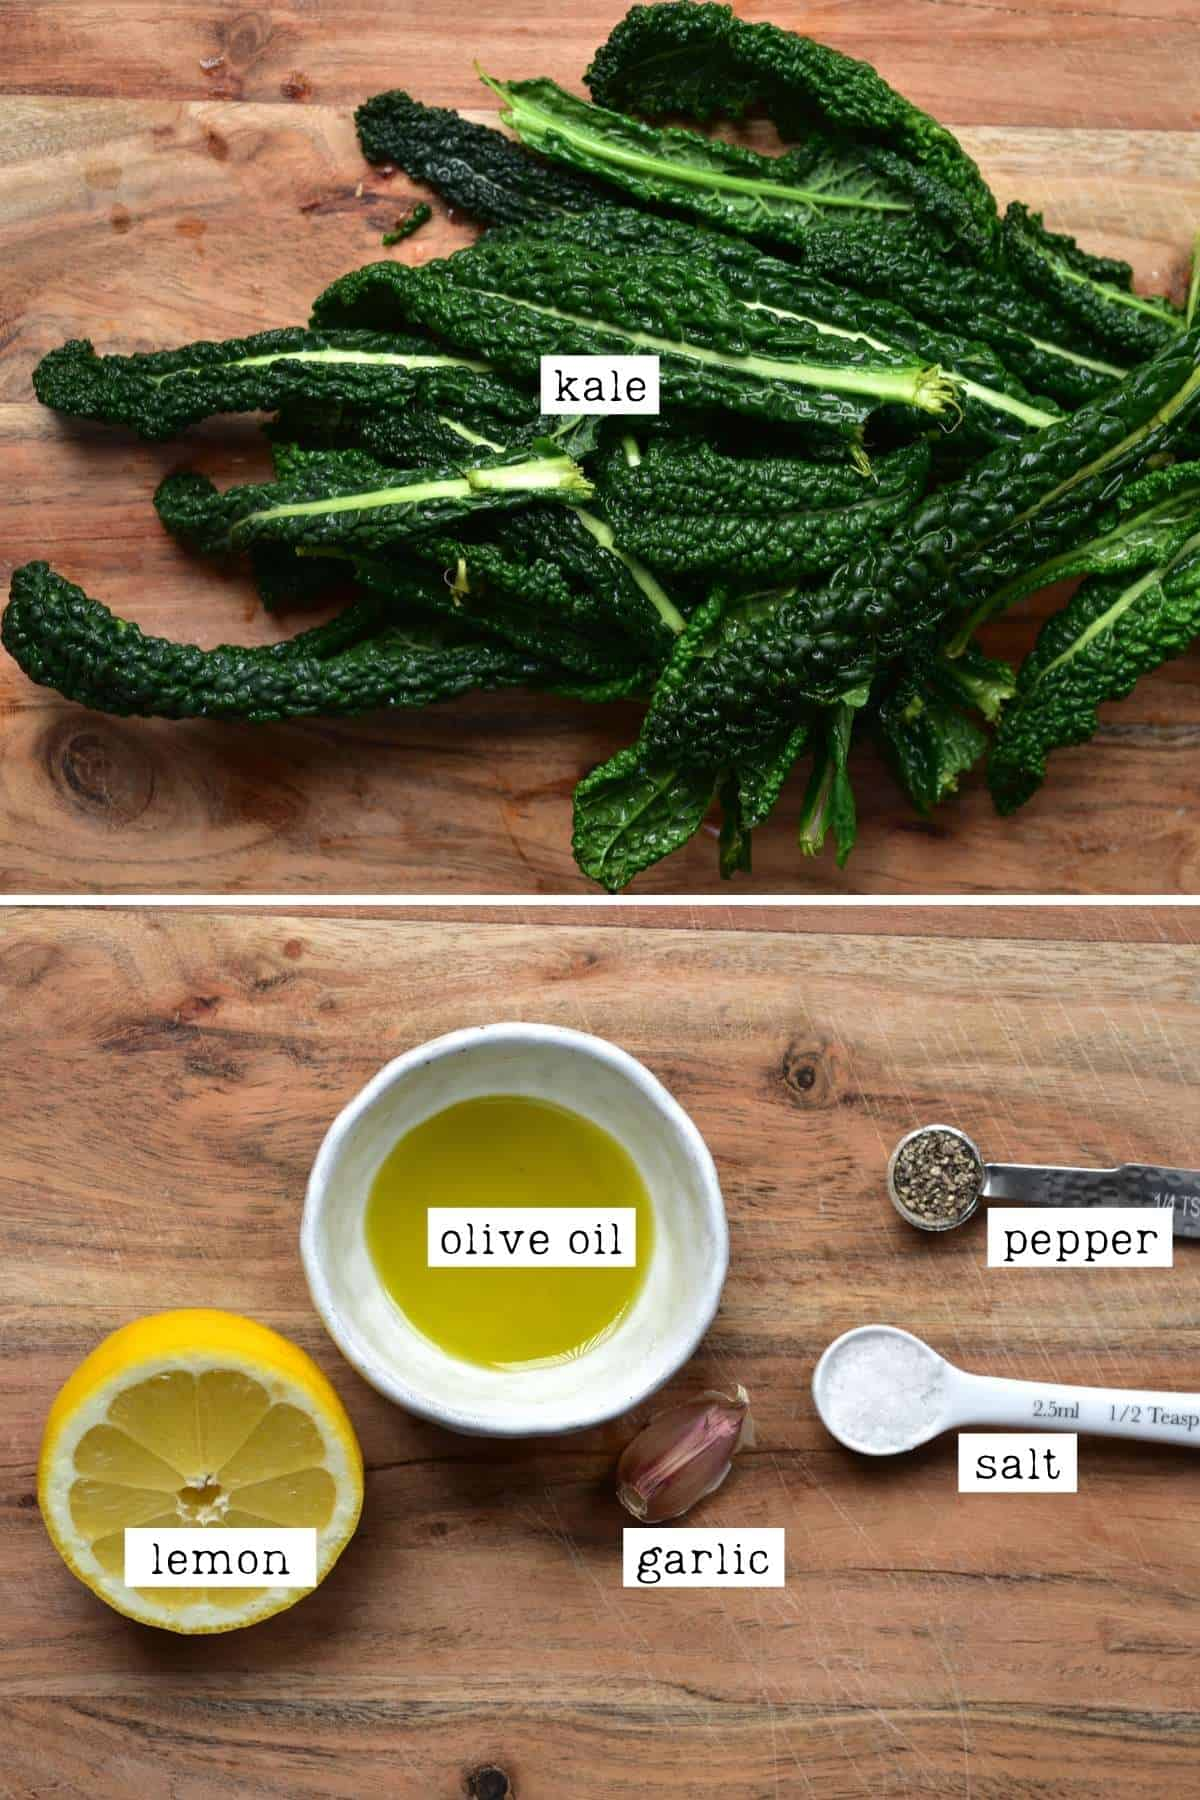 Ingredients for a kale salad